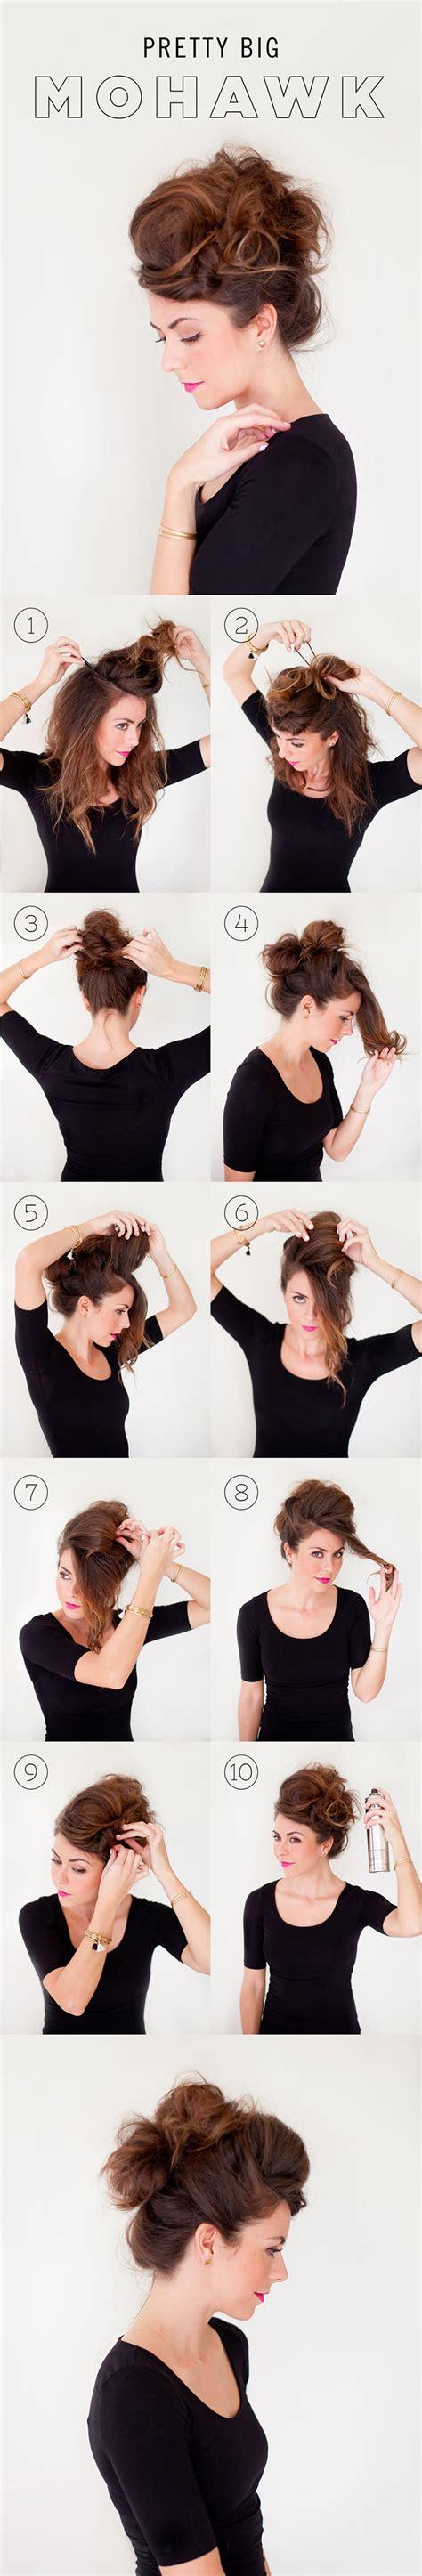 halloween hairstyles step by step halloween hair 27 diy hair tutorials hair romance